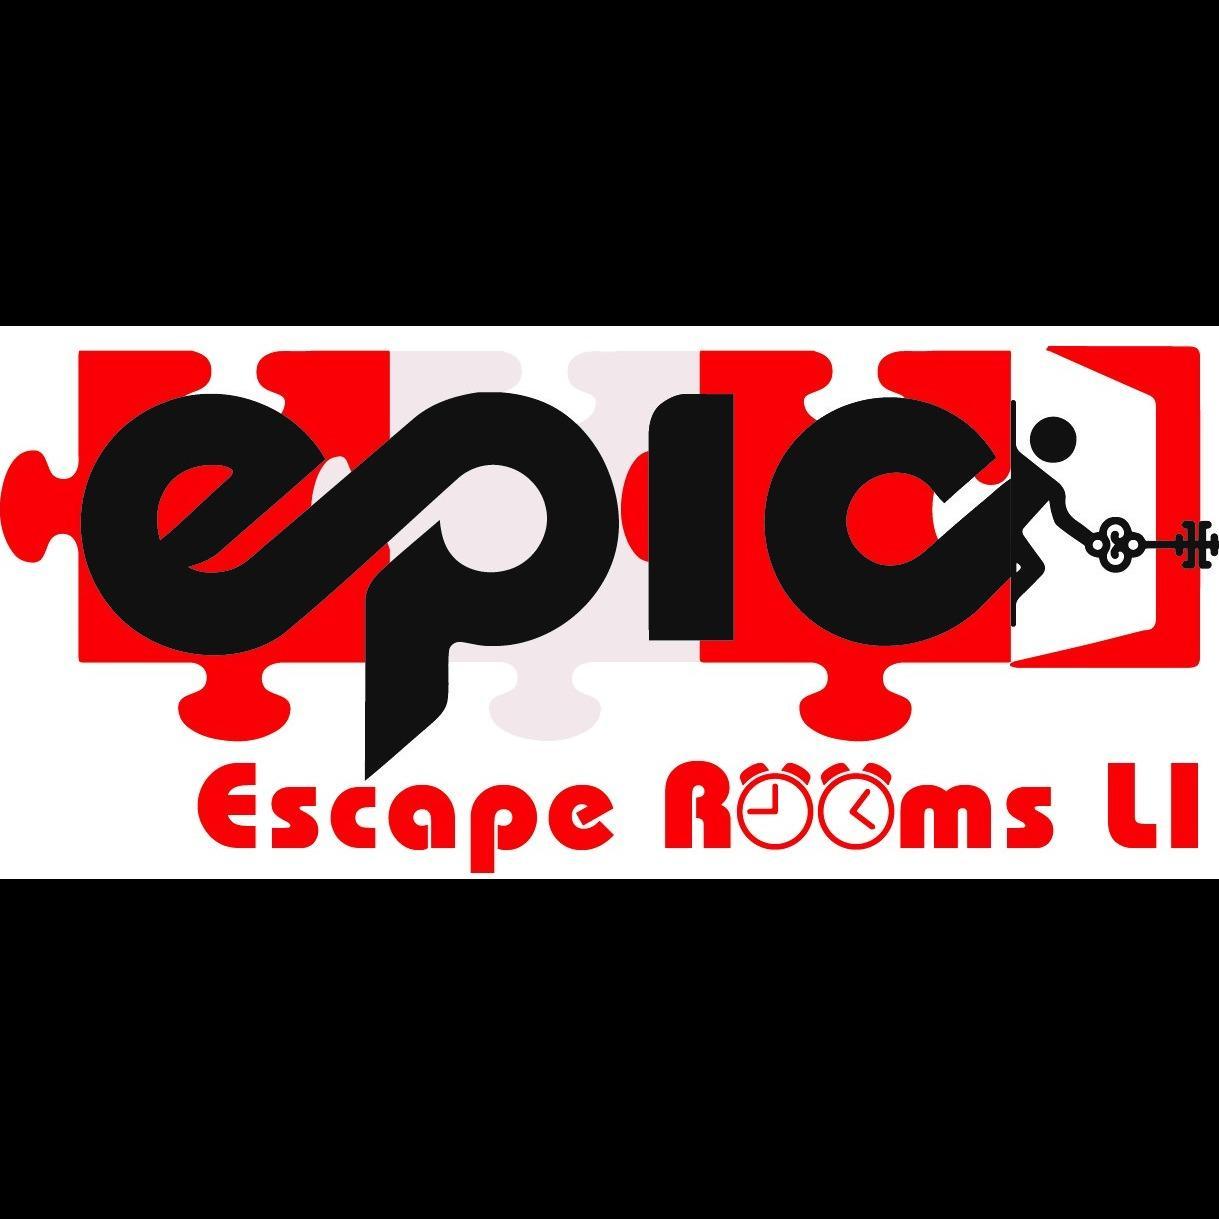 Epic Escape Rooms LI